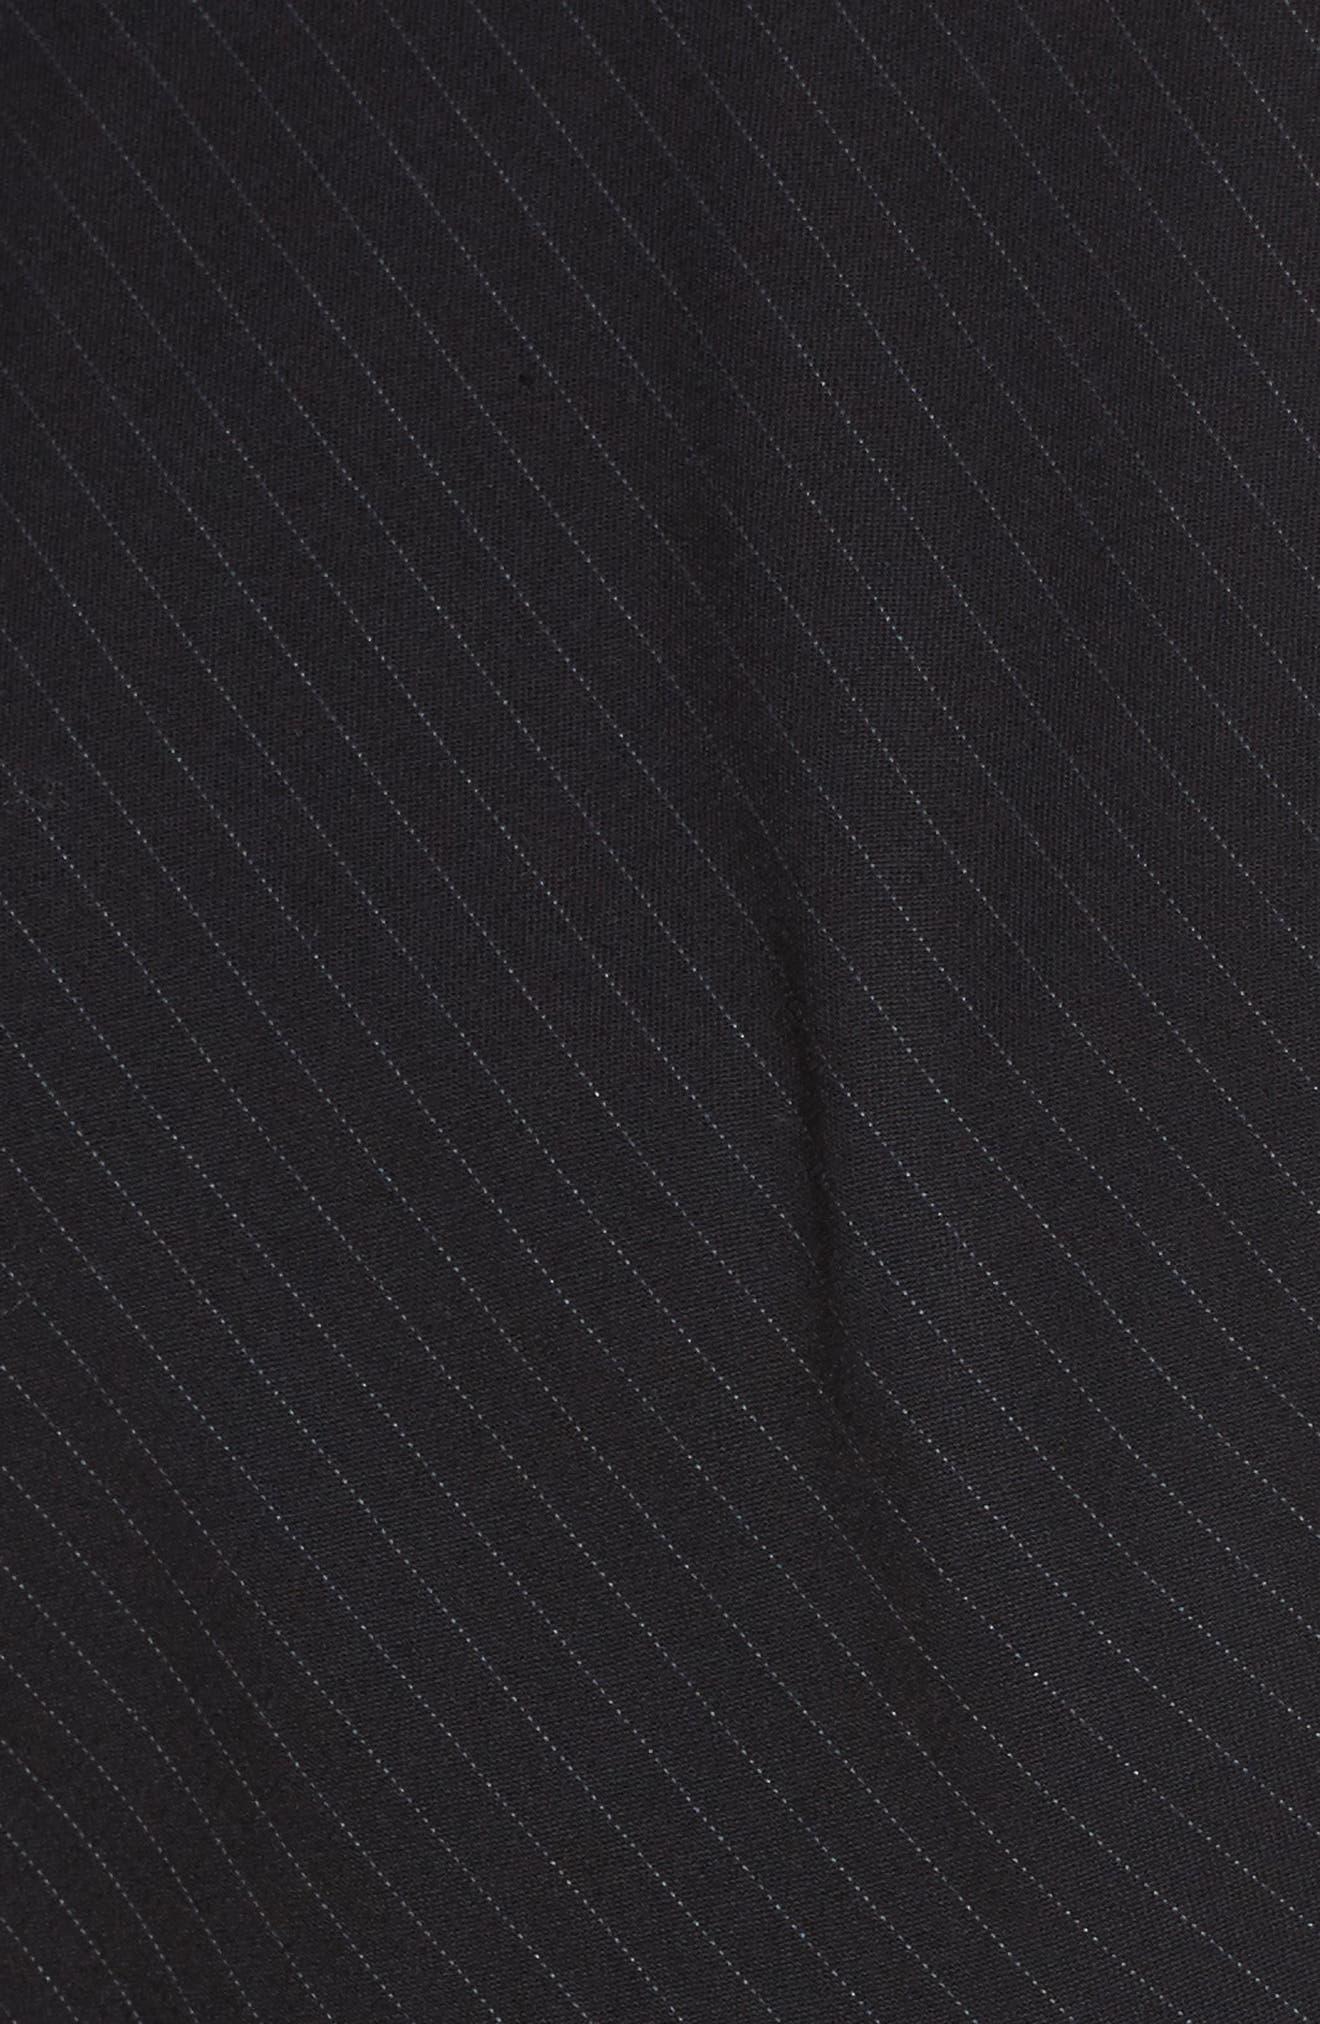 Bias Cut Pinstripe Jumper Dress,                             Alternate thumbnail 5, color,                             Navy Night Pinstripe